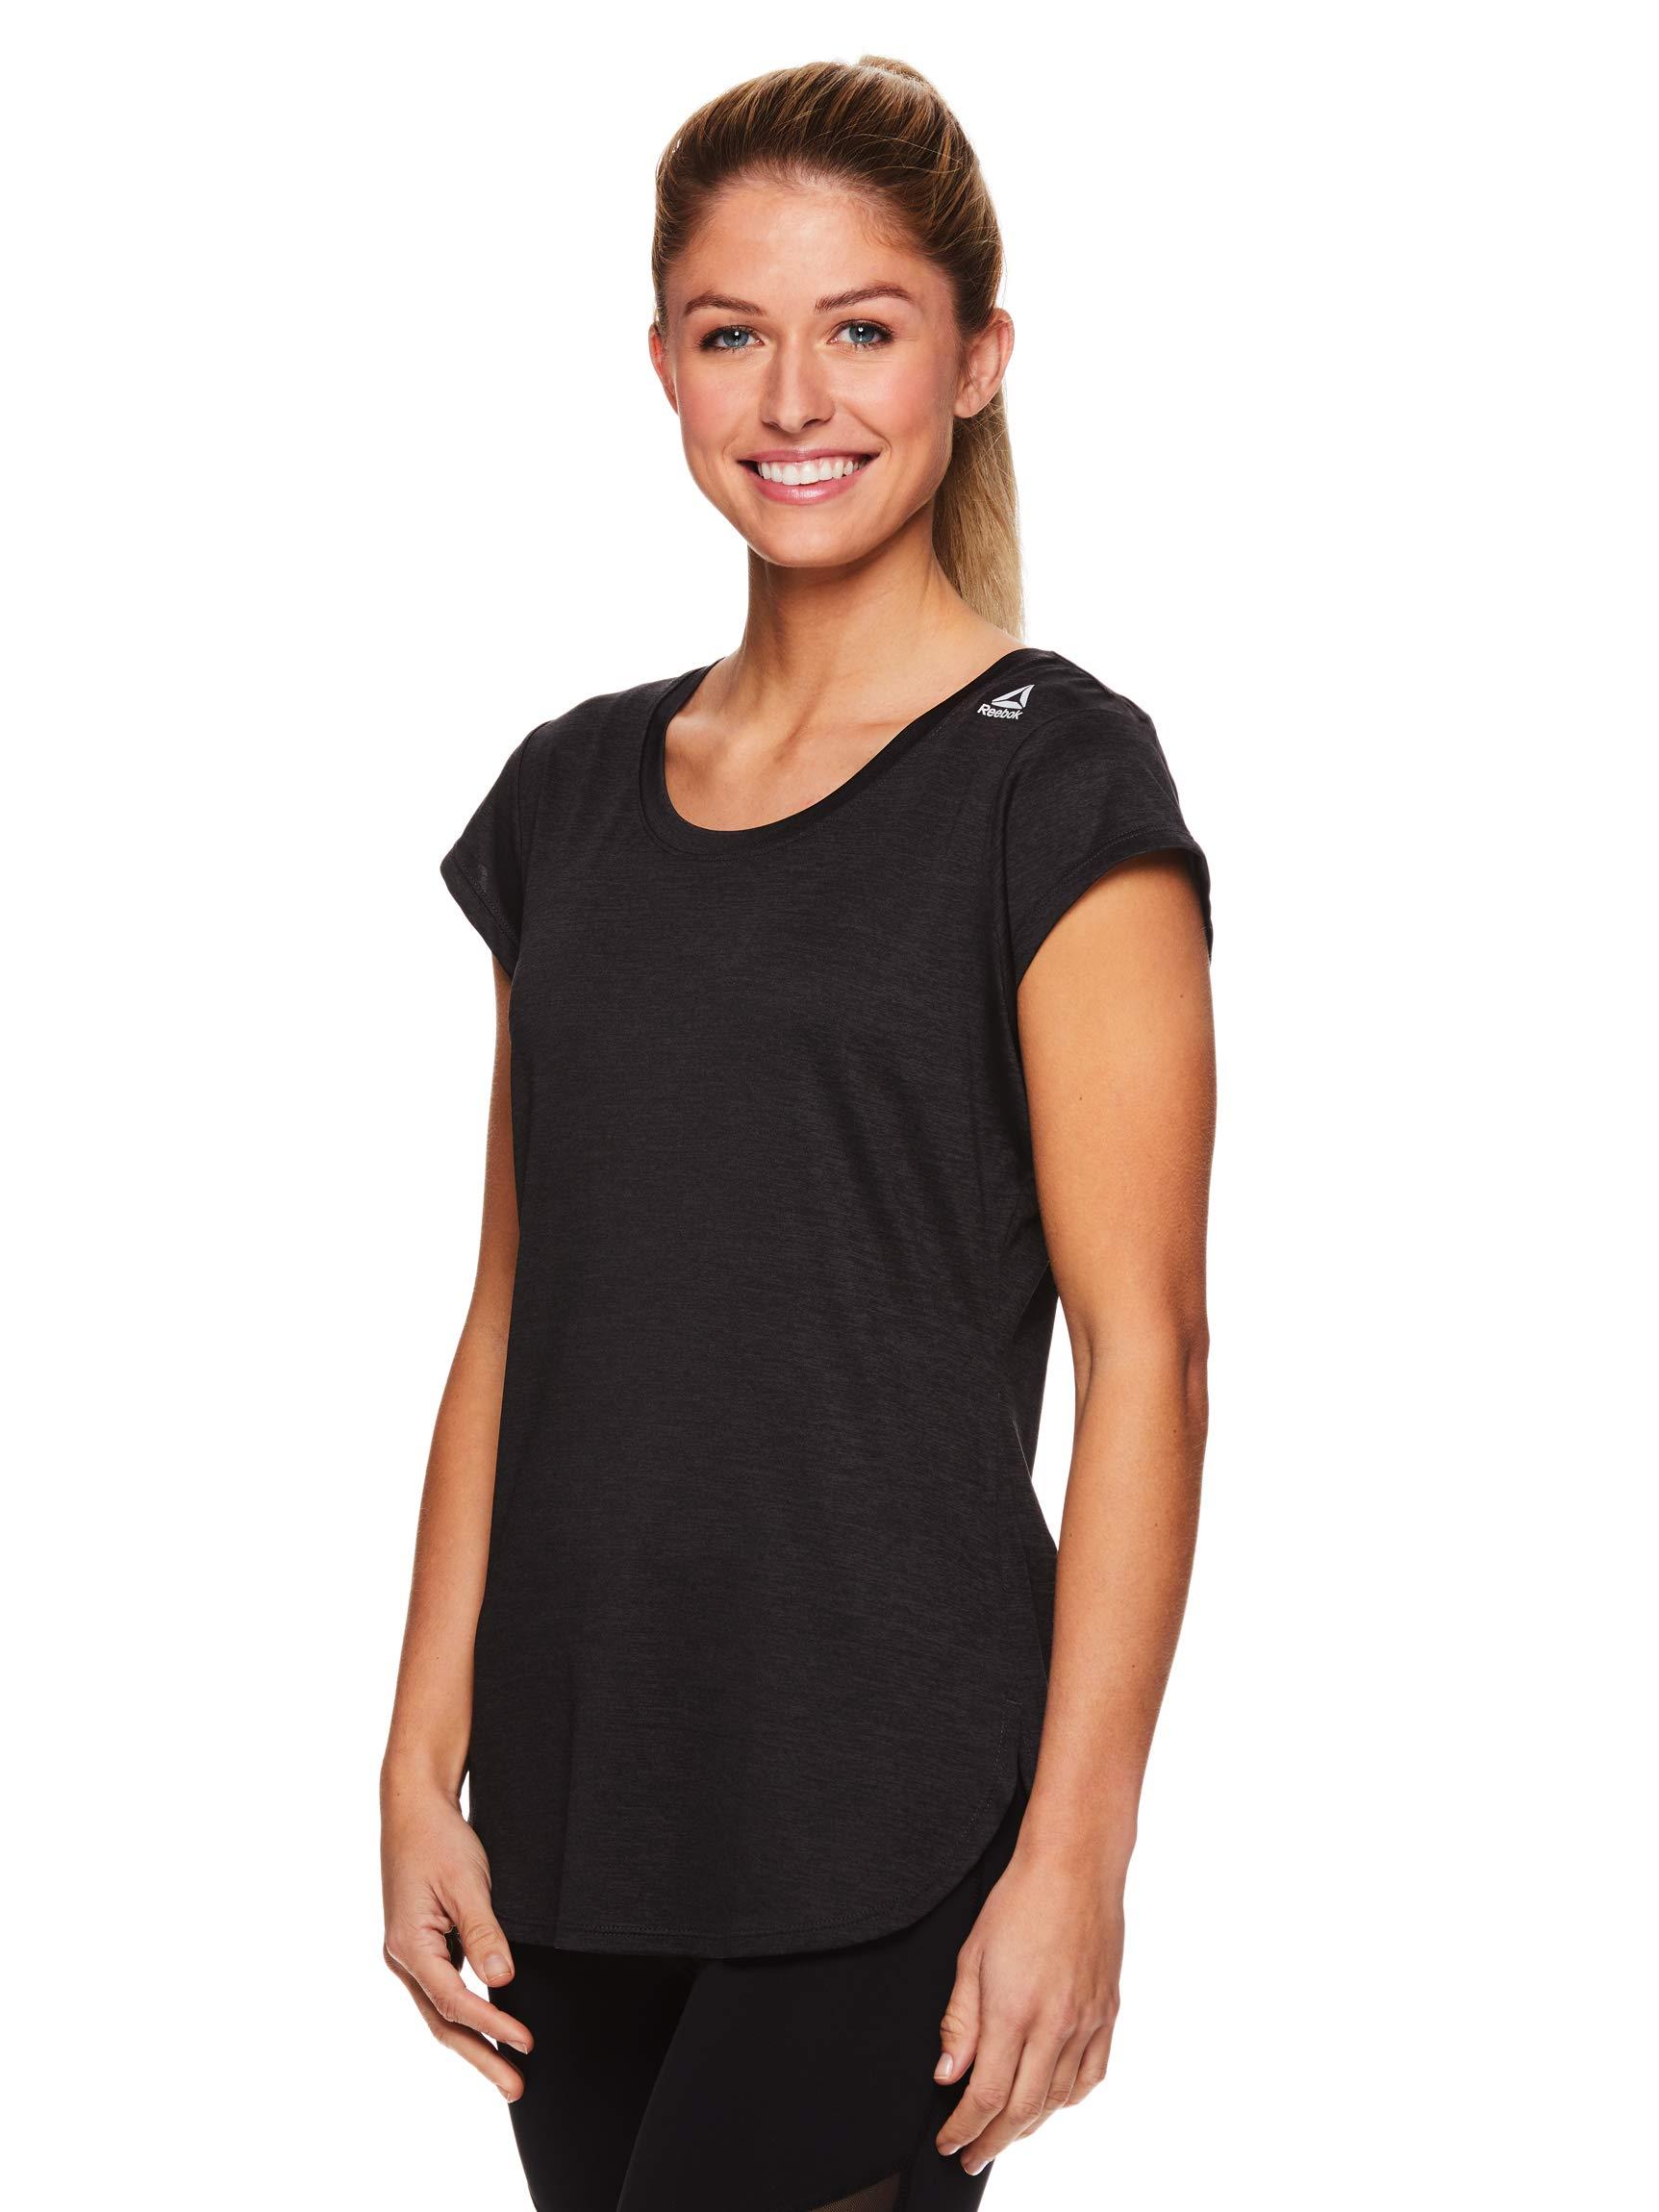 Reebok Women's Legend Performance Short Sleeve T-Shirt with Polyspan Fabric Black Dark Heather